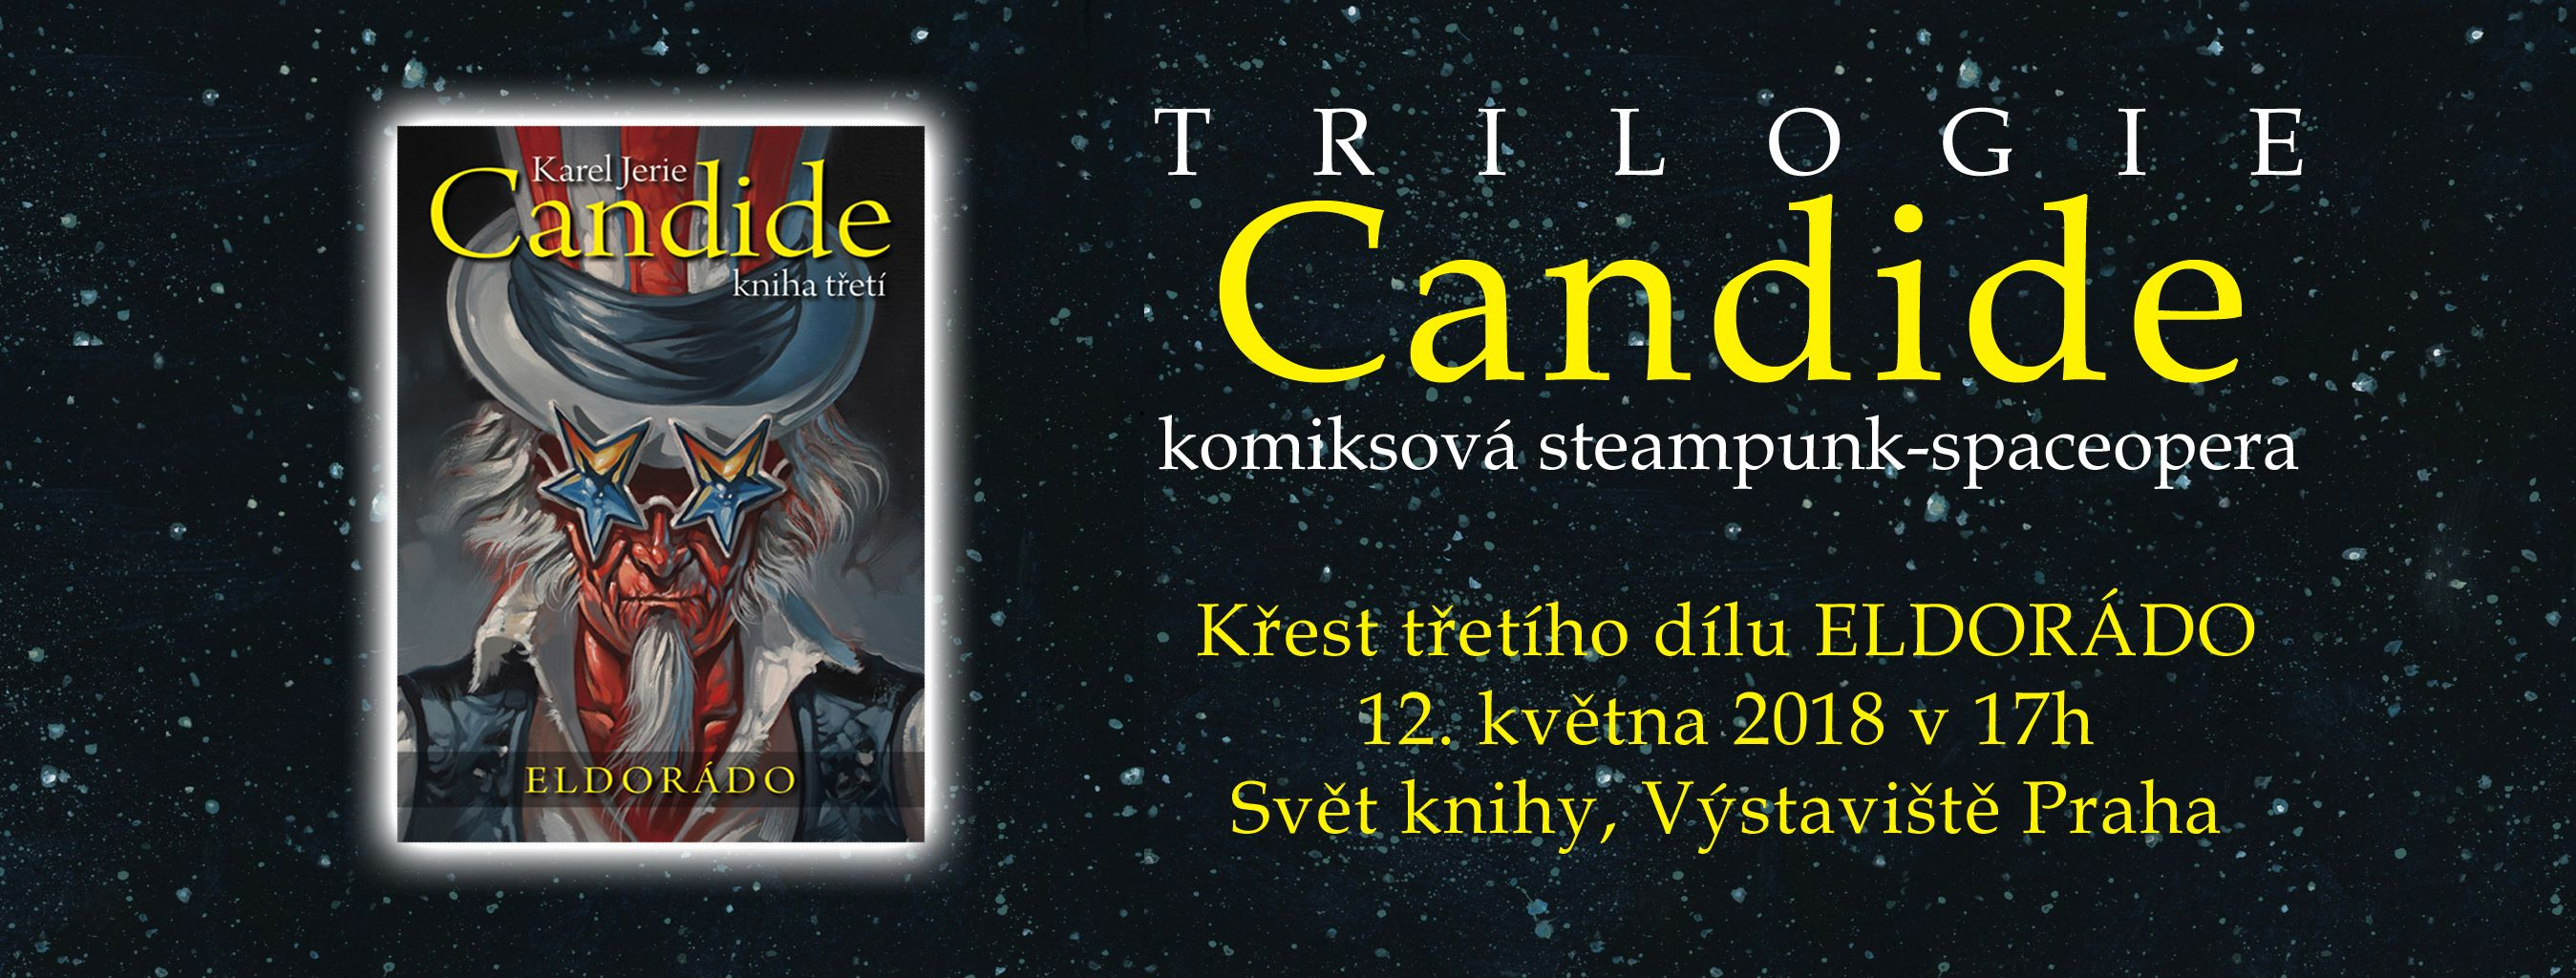 Candide-trilogie